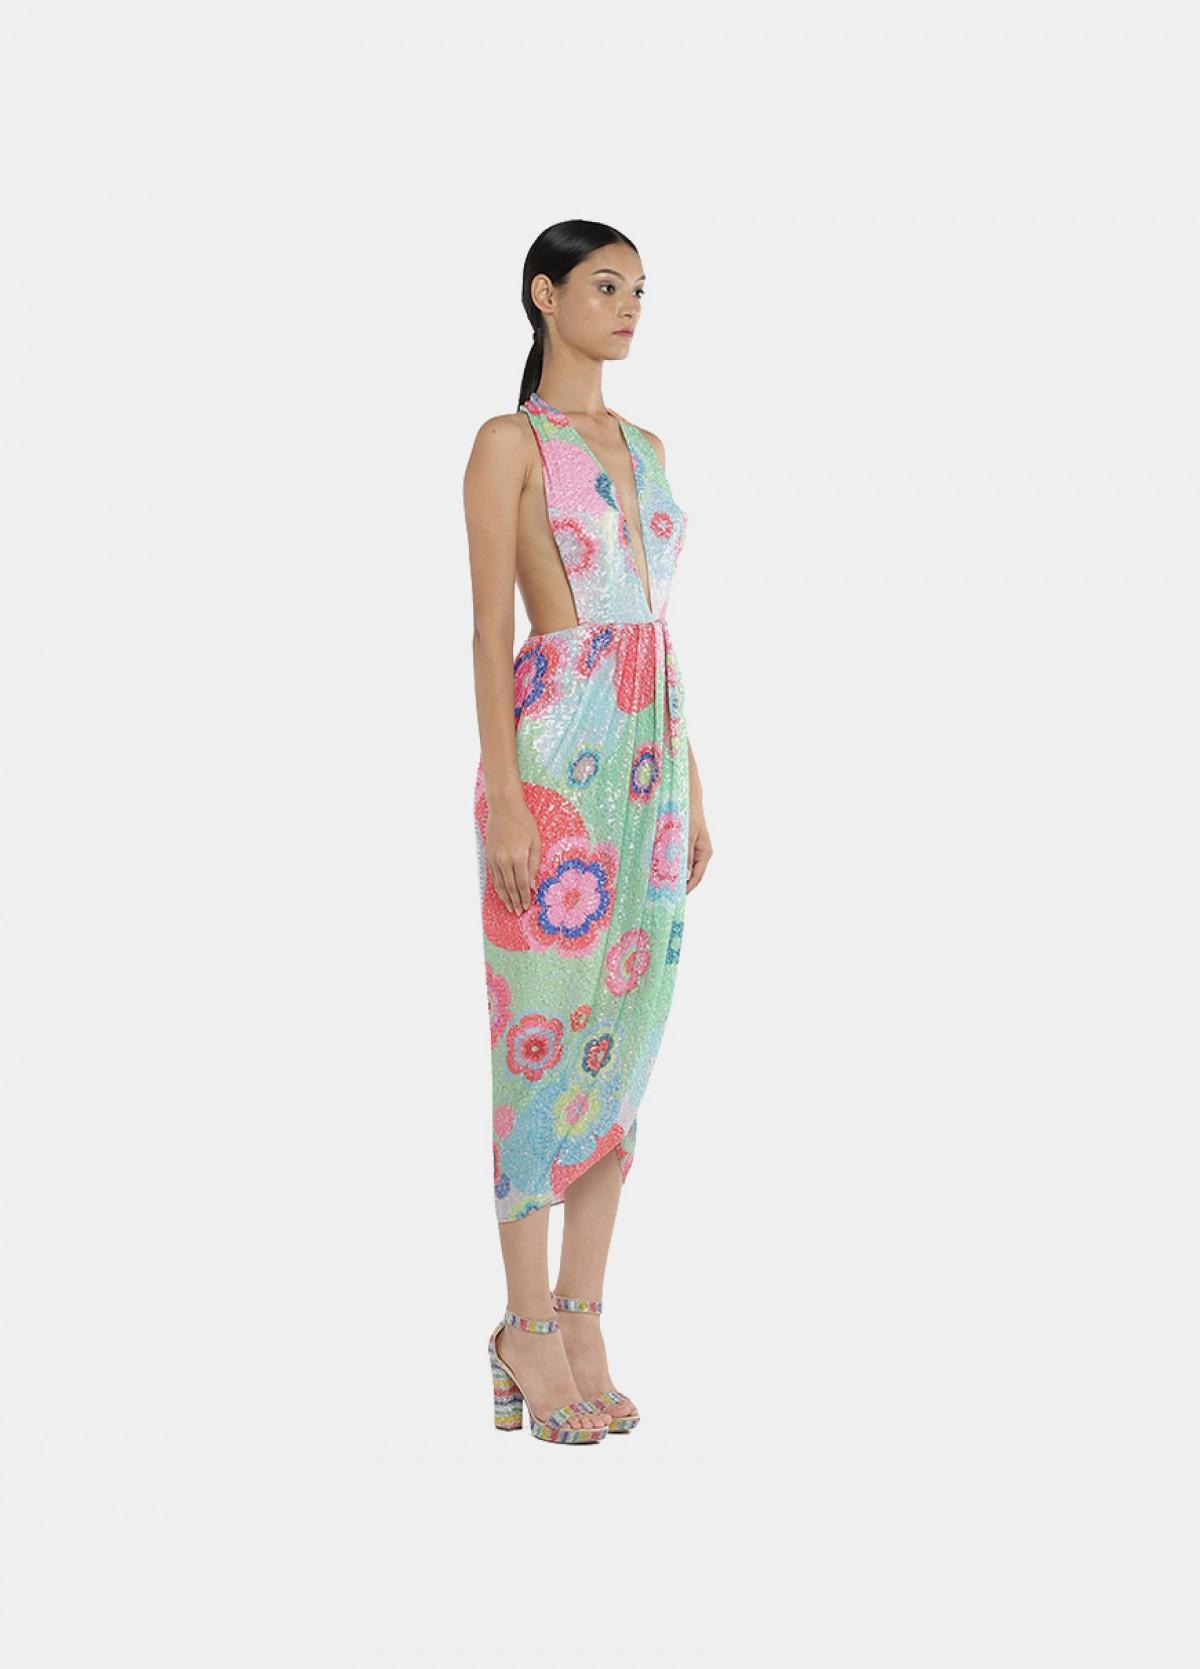 The Margarita Dress